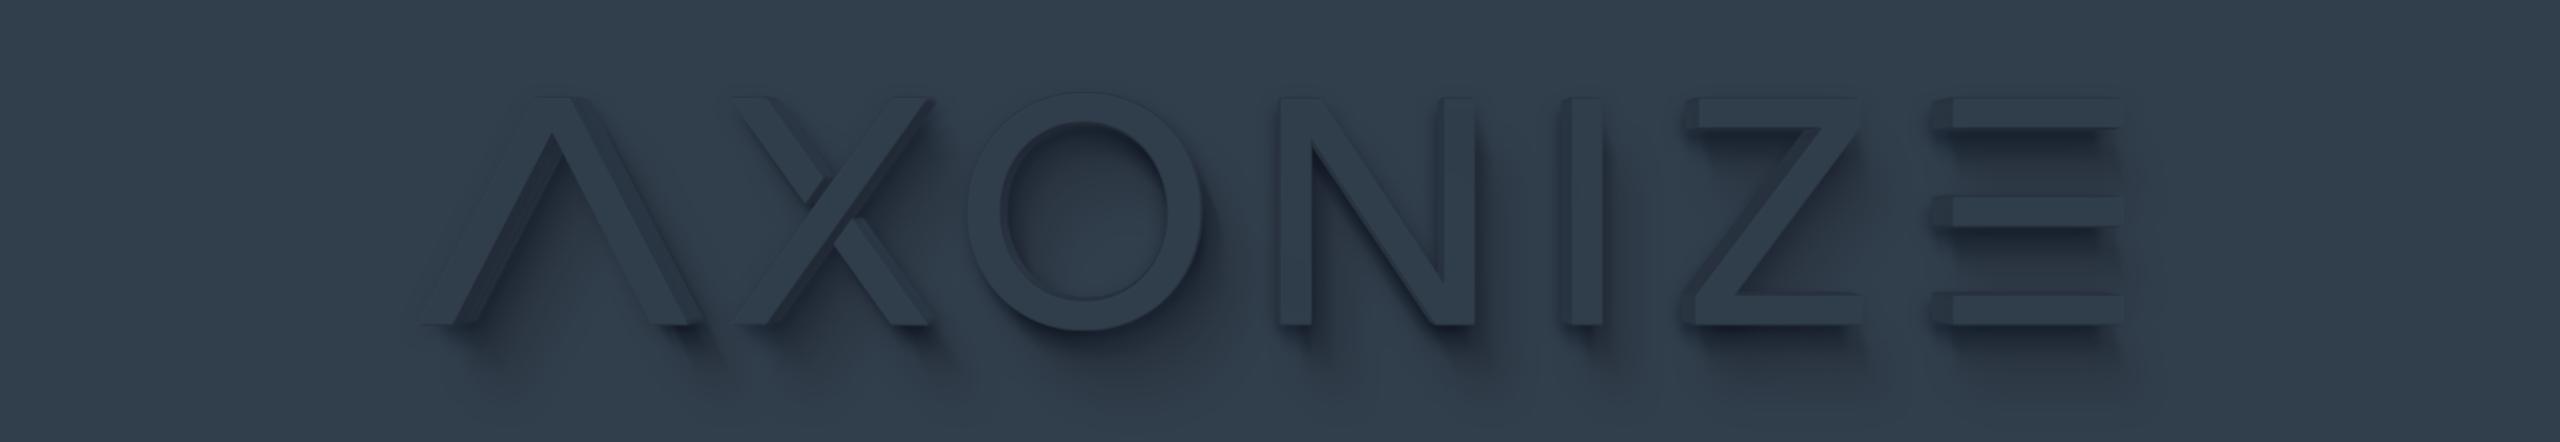 Axonize dark logo